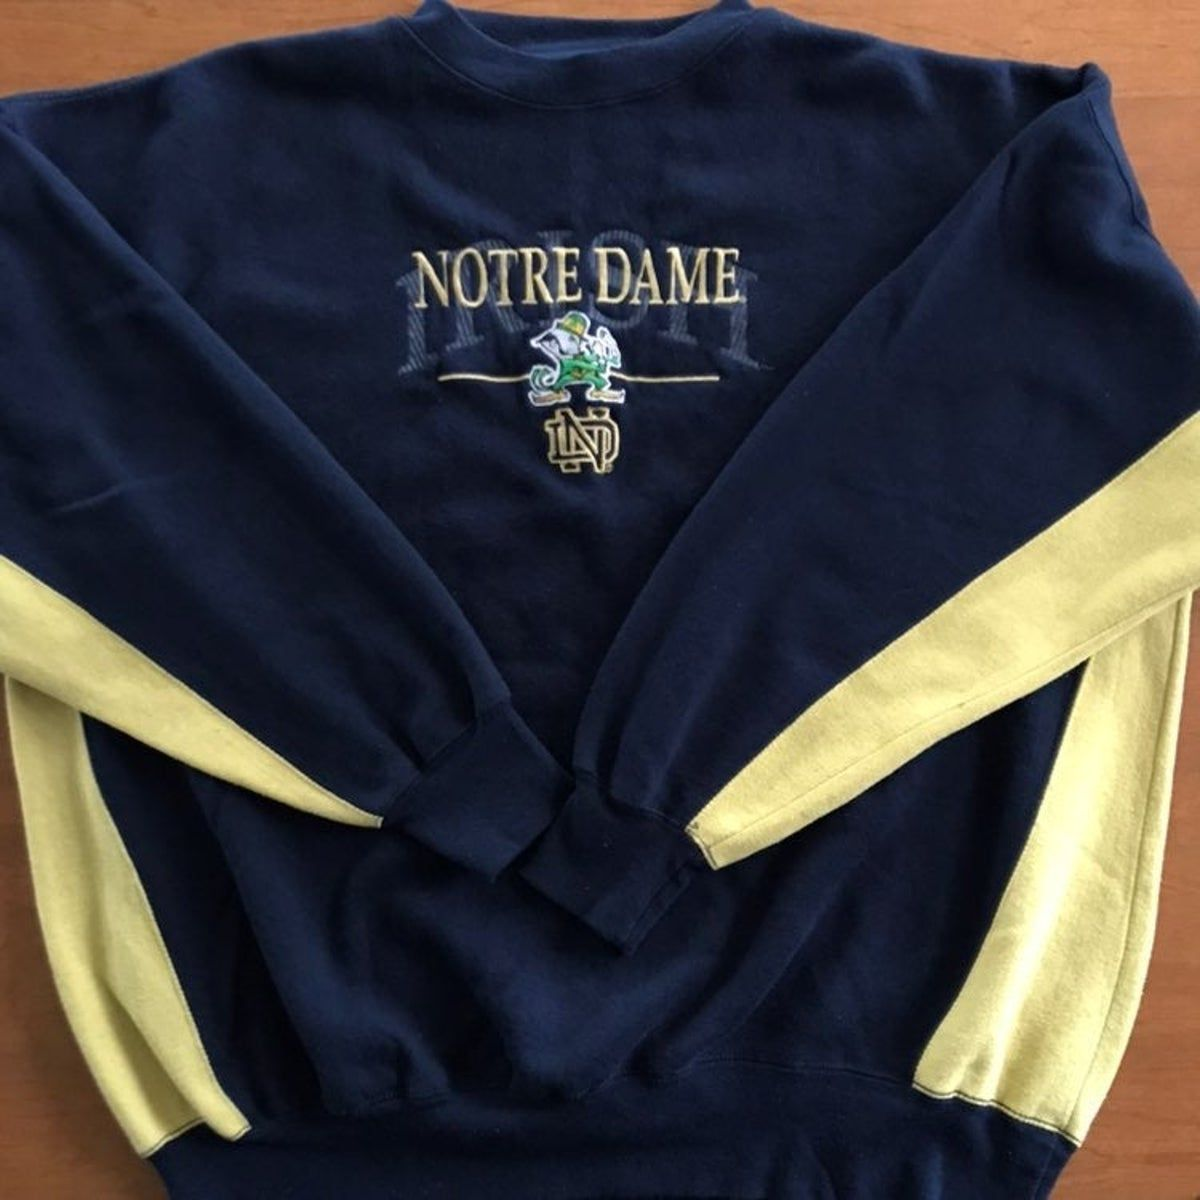 Vintage Notre Dame Crewneck Sweatshirt Vintage Crewneck Sweatshirt Sweatshirts Hoodie Design [ 1200 x 1200 Pixel ]